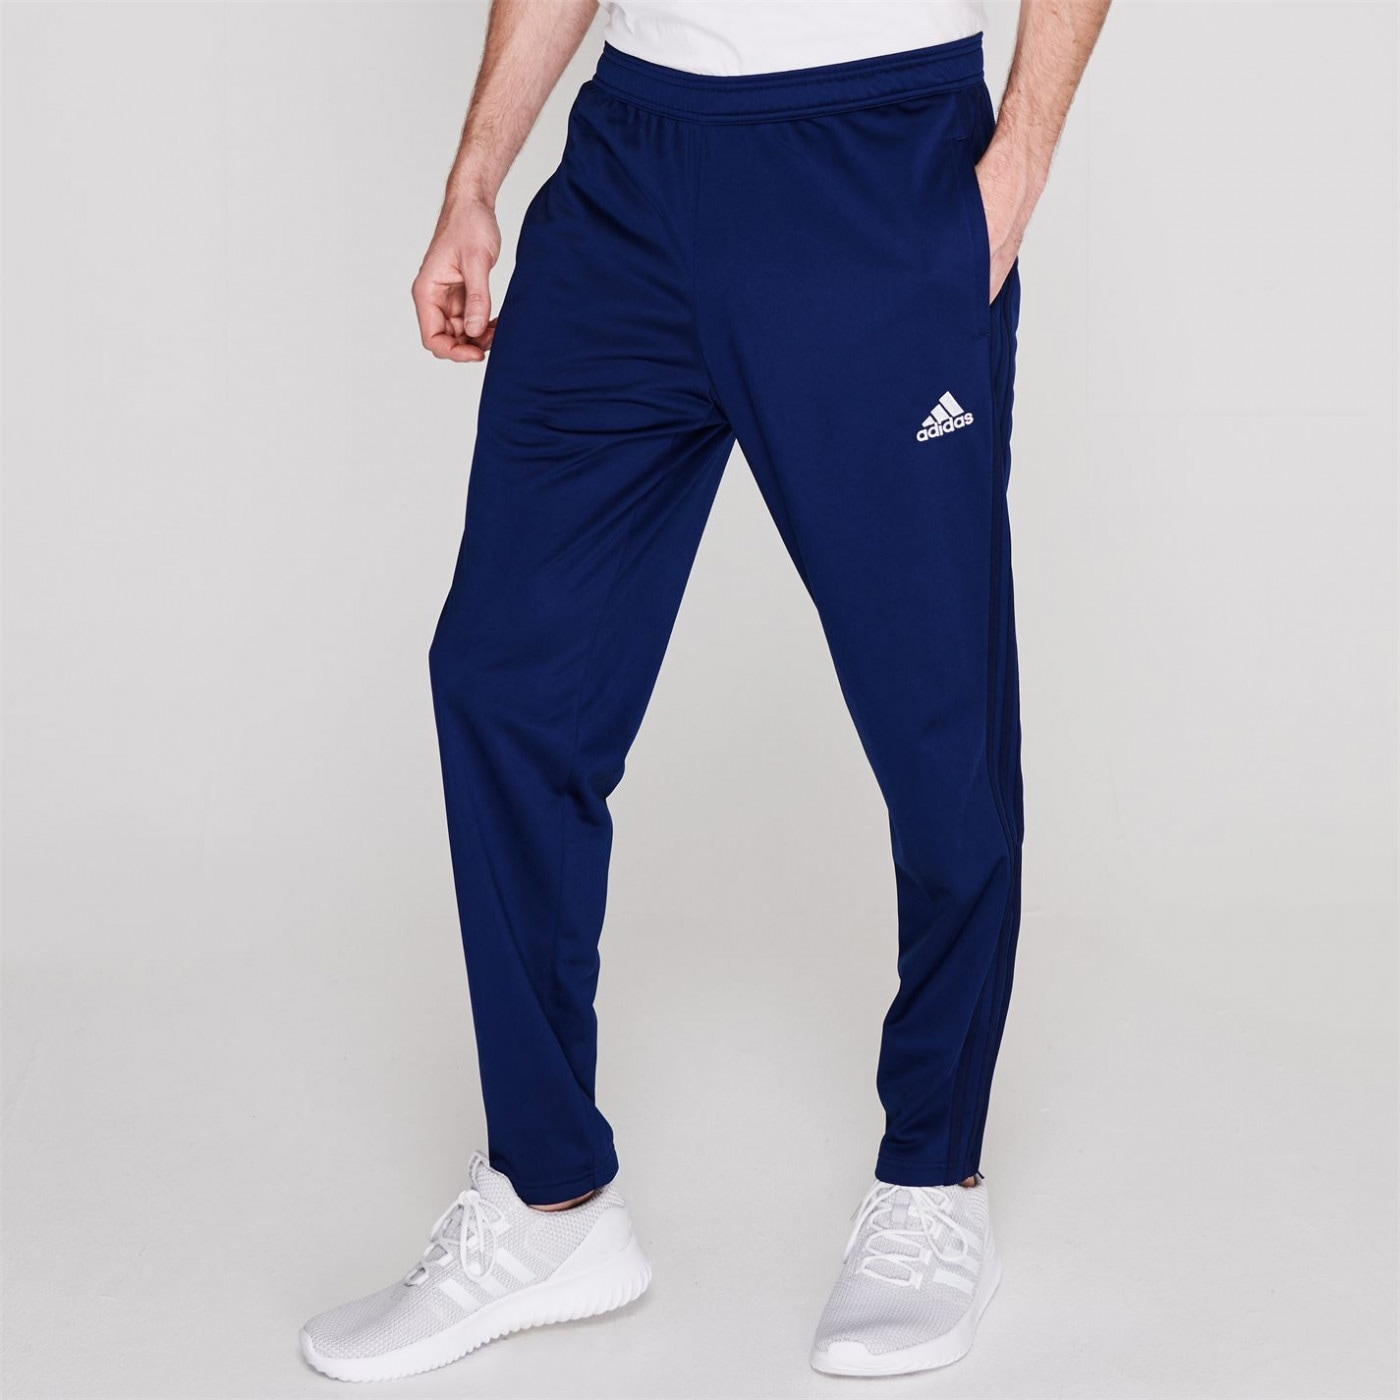 Adidas Condivo Tracksuit Bottoms Mens